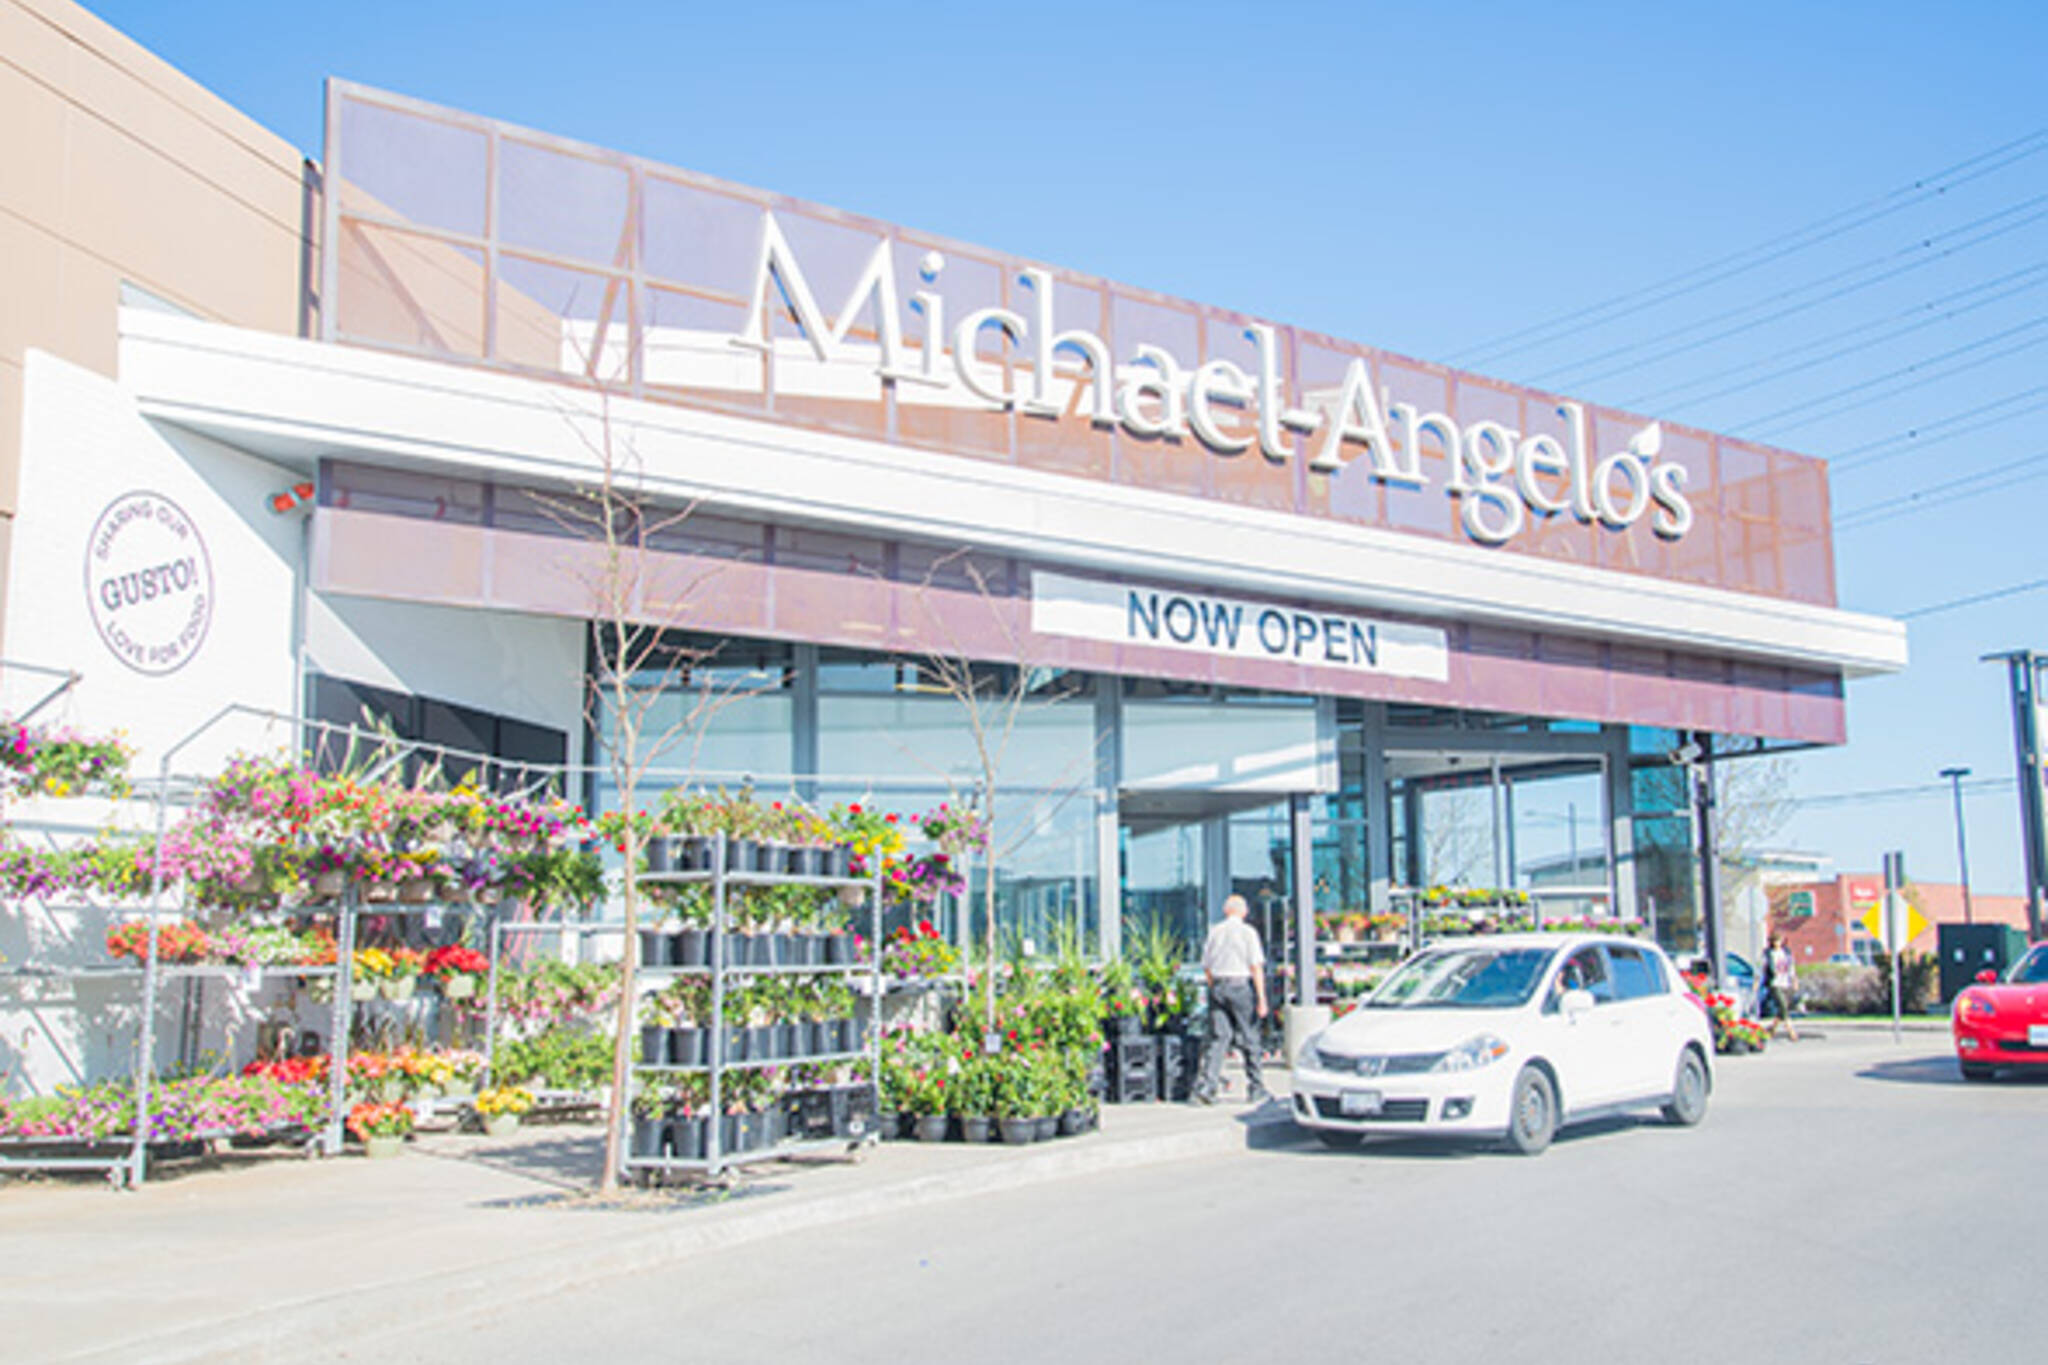 Michael-Angelo's Marketplace